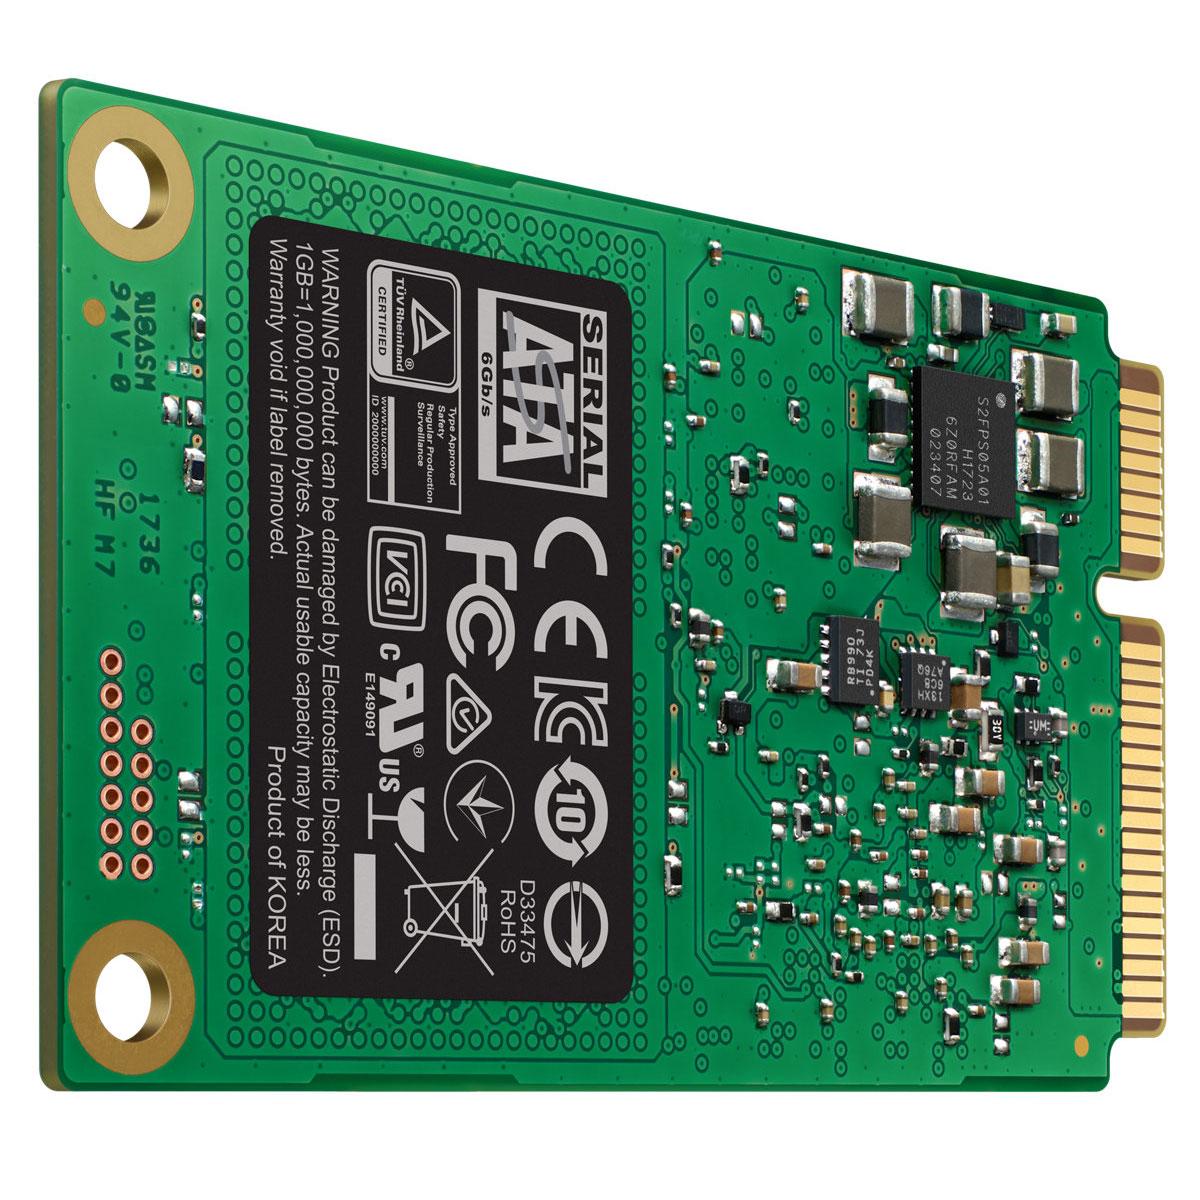 Samsung 860 EVO 240-275Go mSATA - Disque SSD Samsung - Cybertek.fr - 1